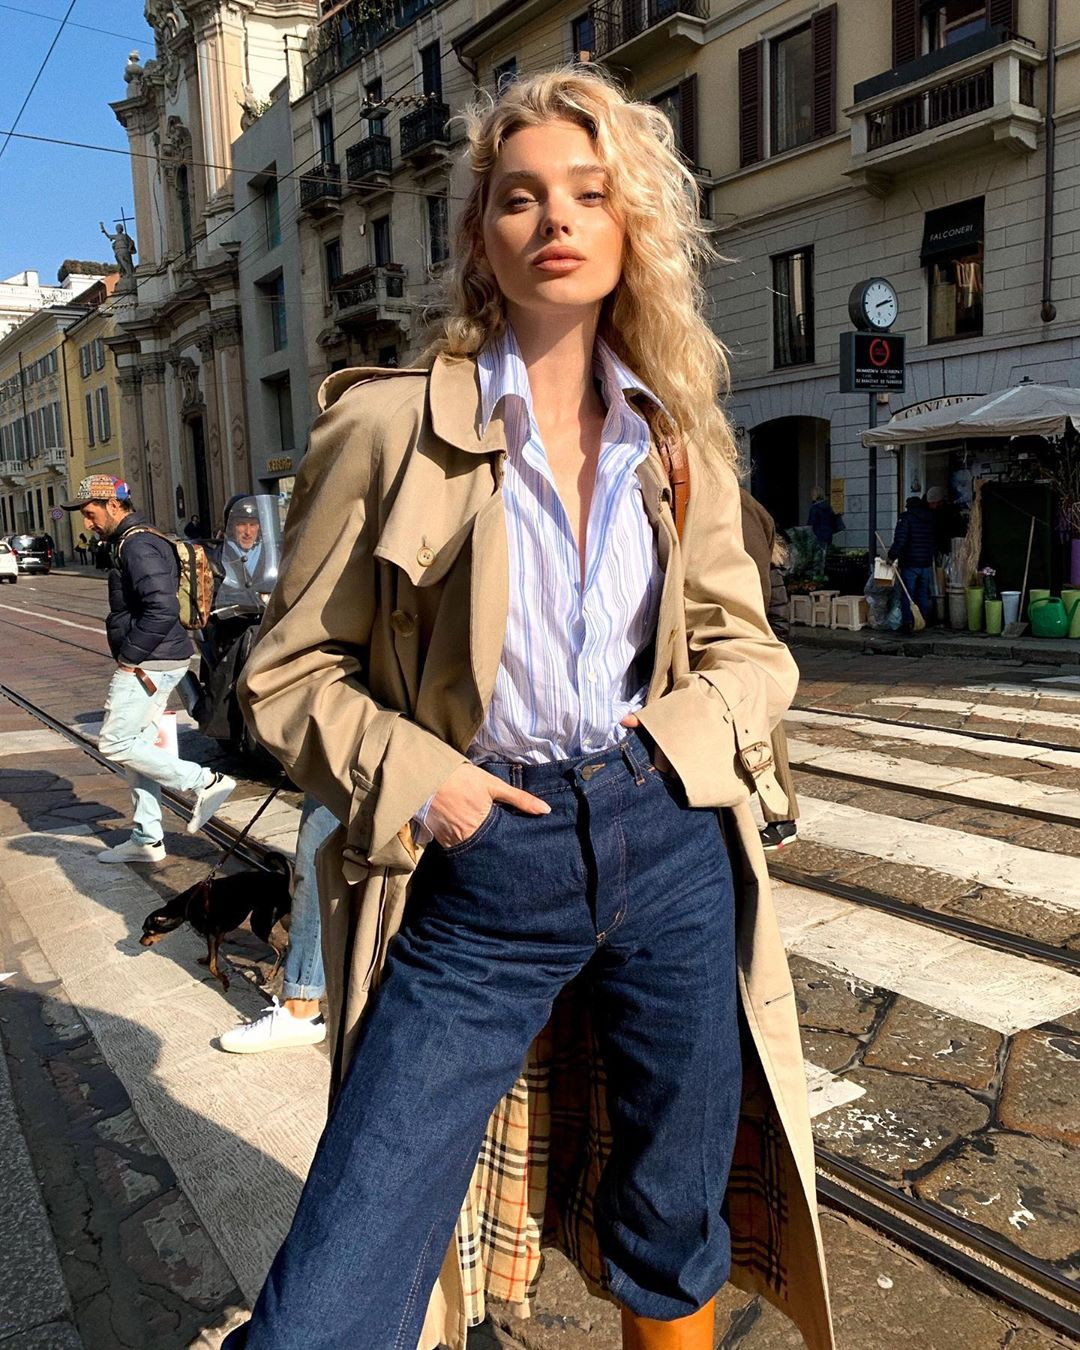 Elsa Hosk trench coat, denim, jeans outfits for women